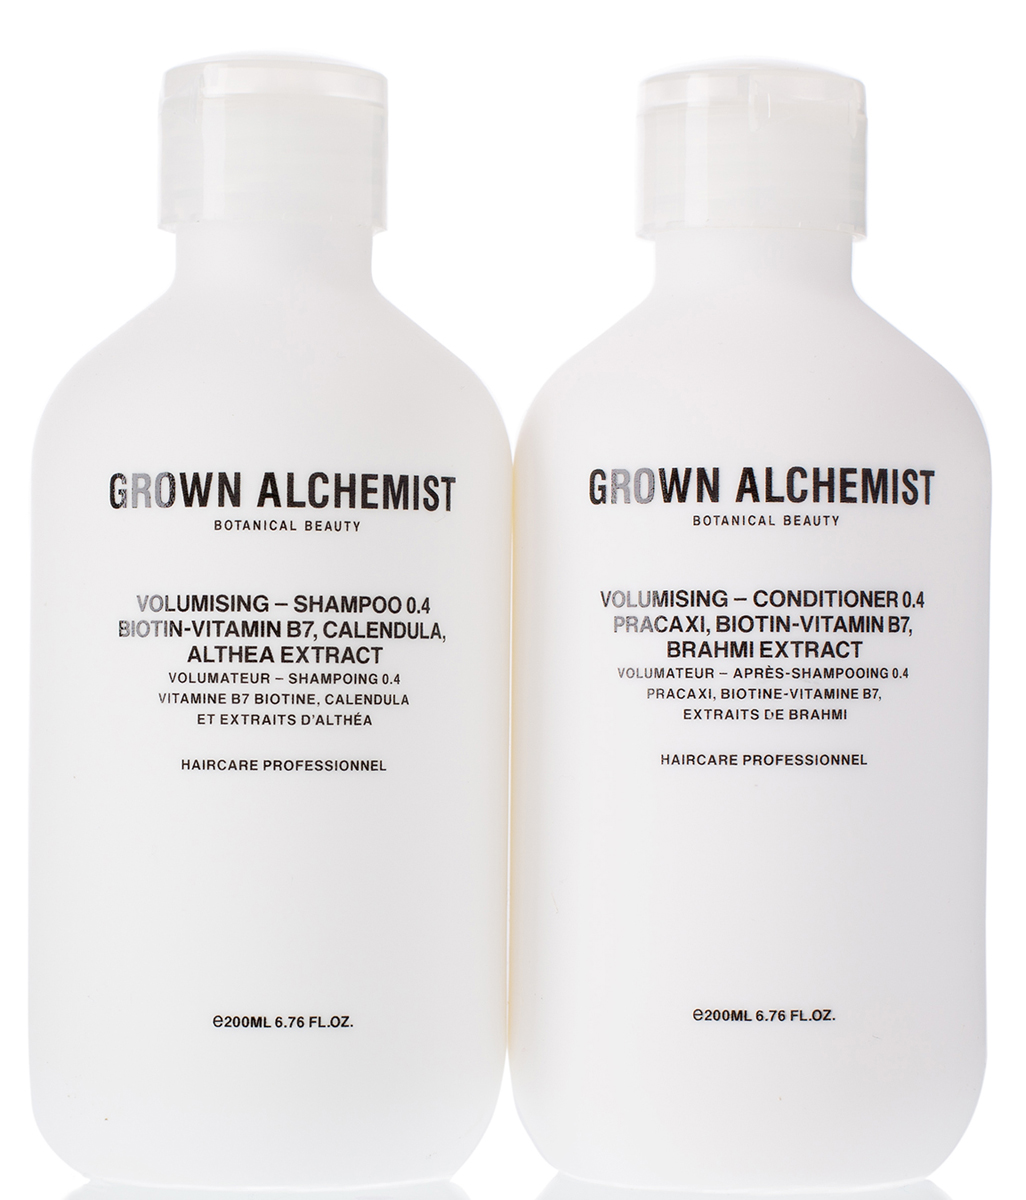 Grown Alchemist Набор для придания объема волосам (Шампунь для придания объема волосам 200 мл, Кондиционер для придания объема волосам 200 мл)